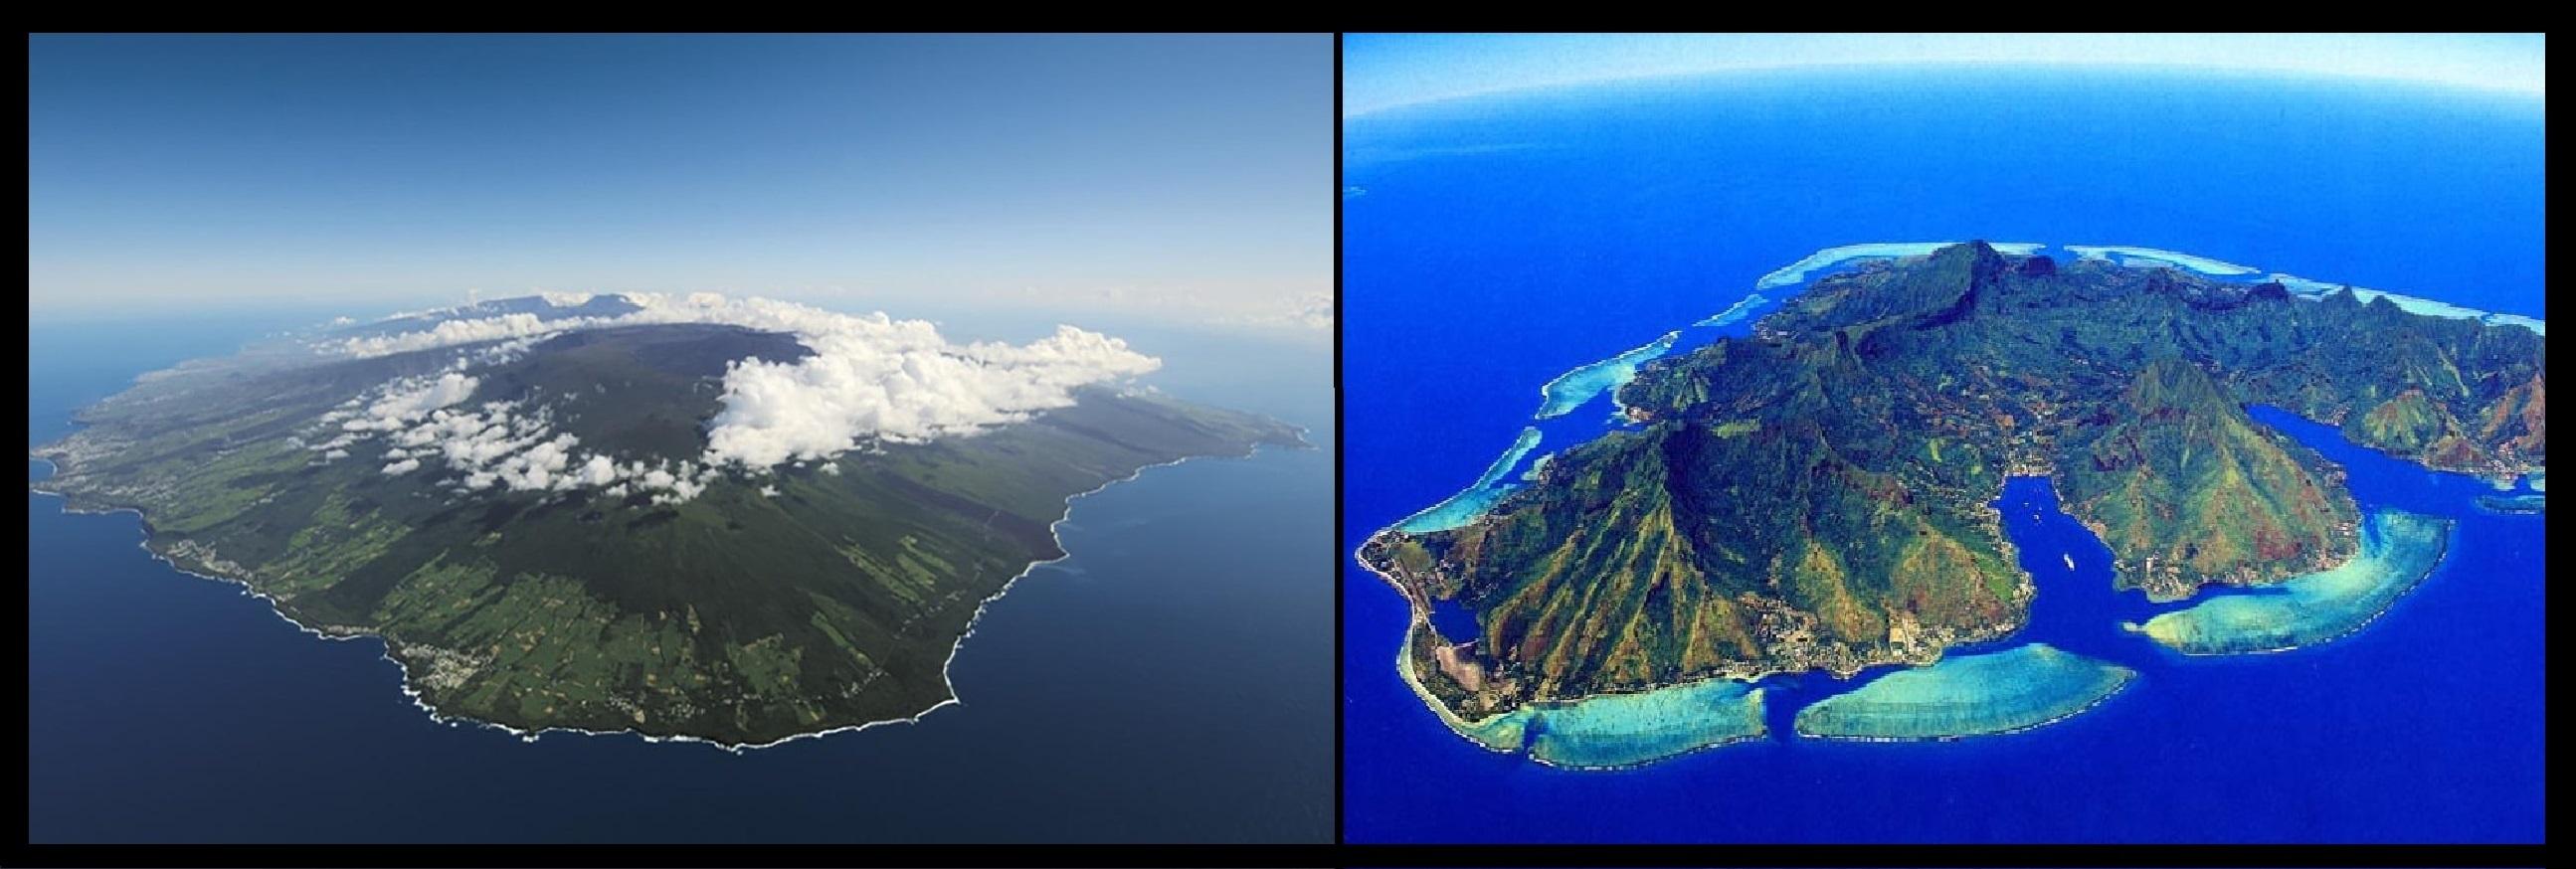 ile de la Réunion, Ile de Moorea